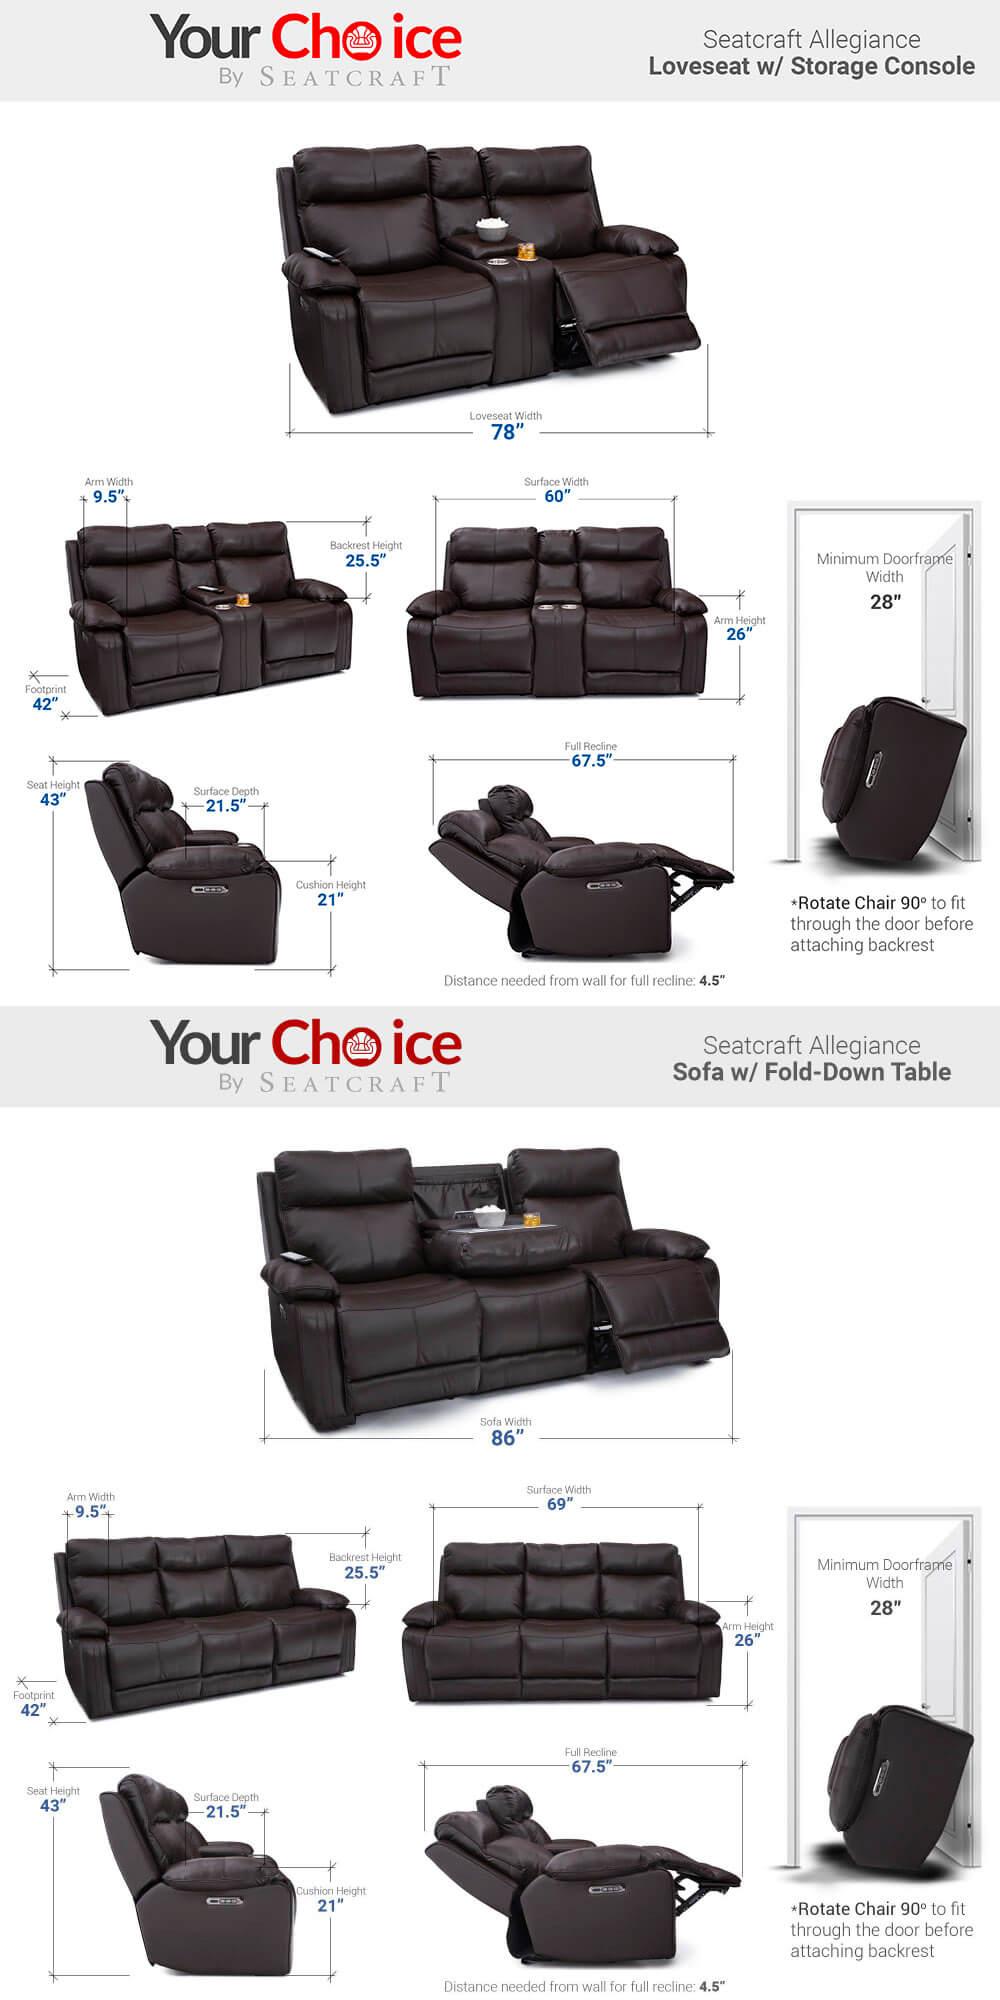 Seatcraft Allegiance Media Room Seating Dimensions